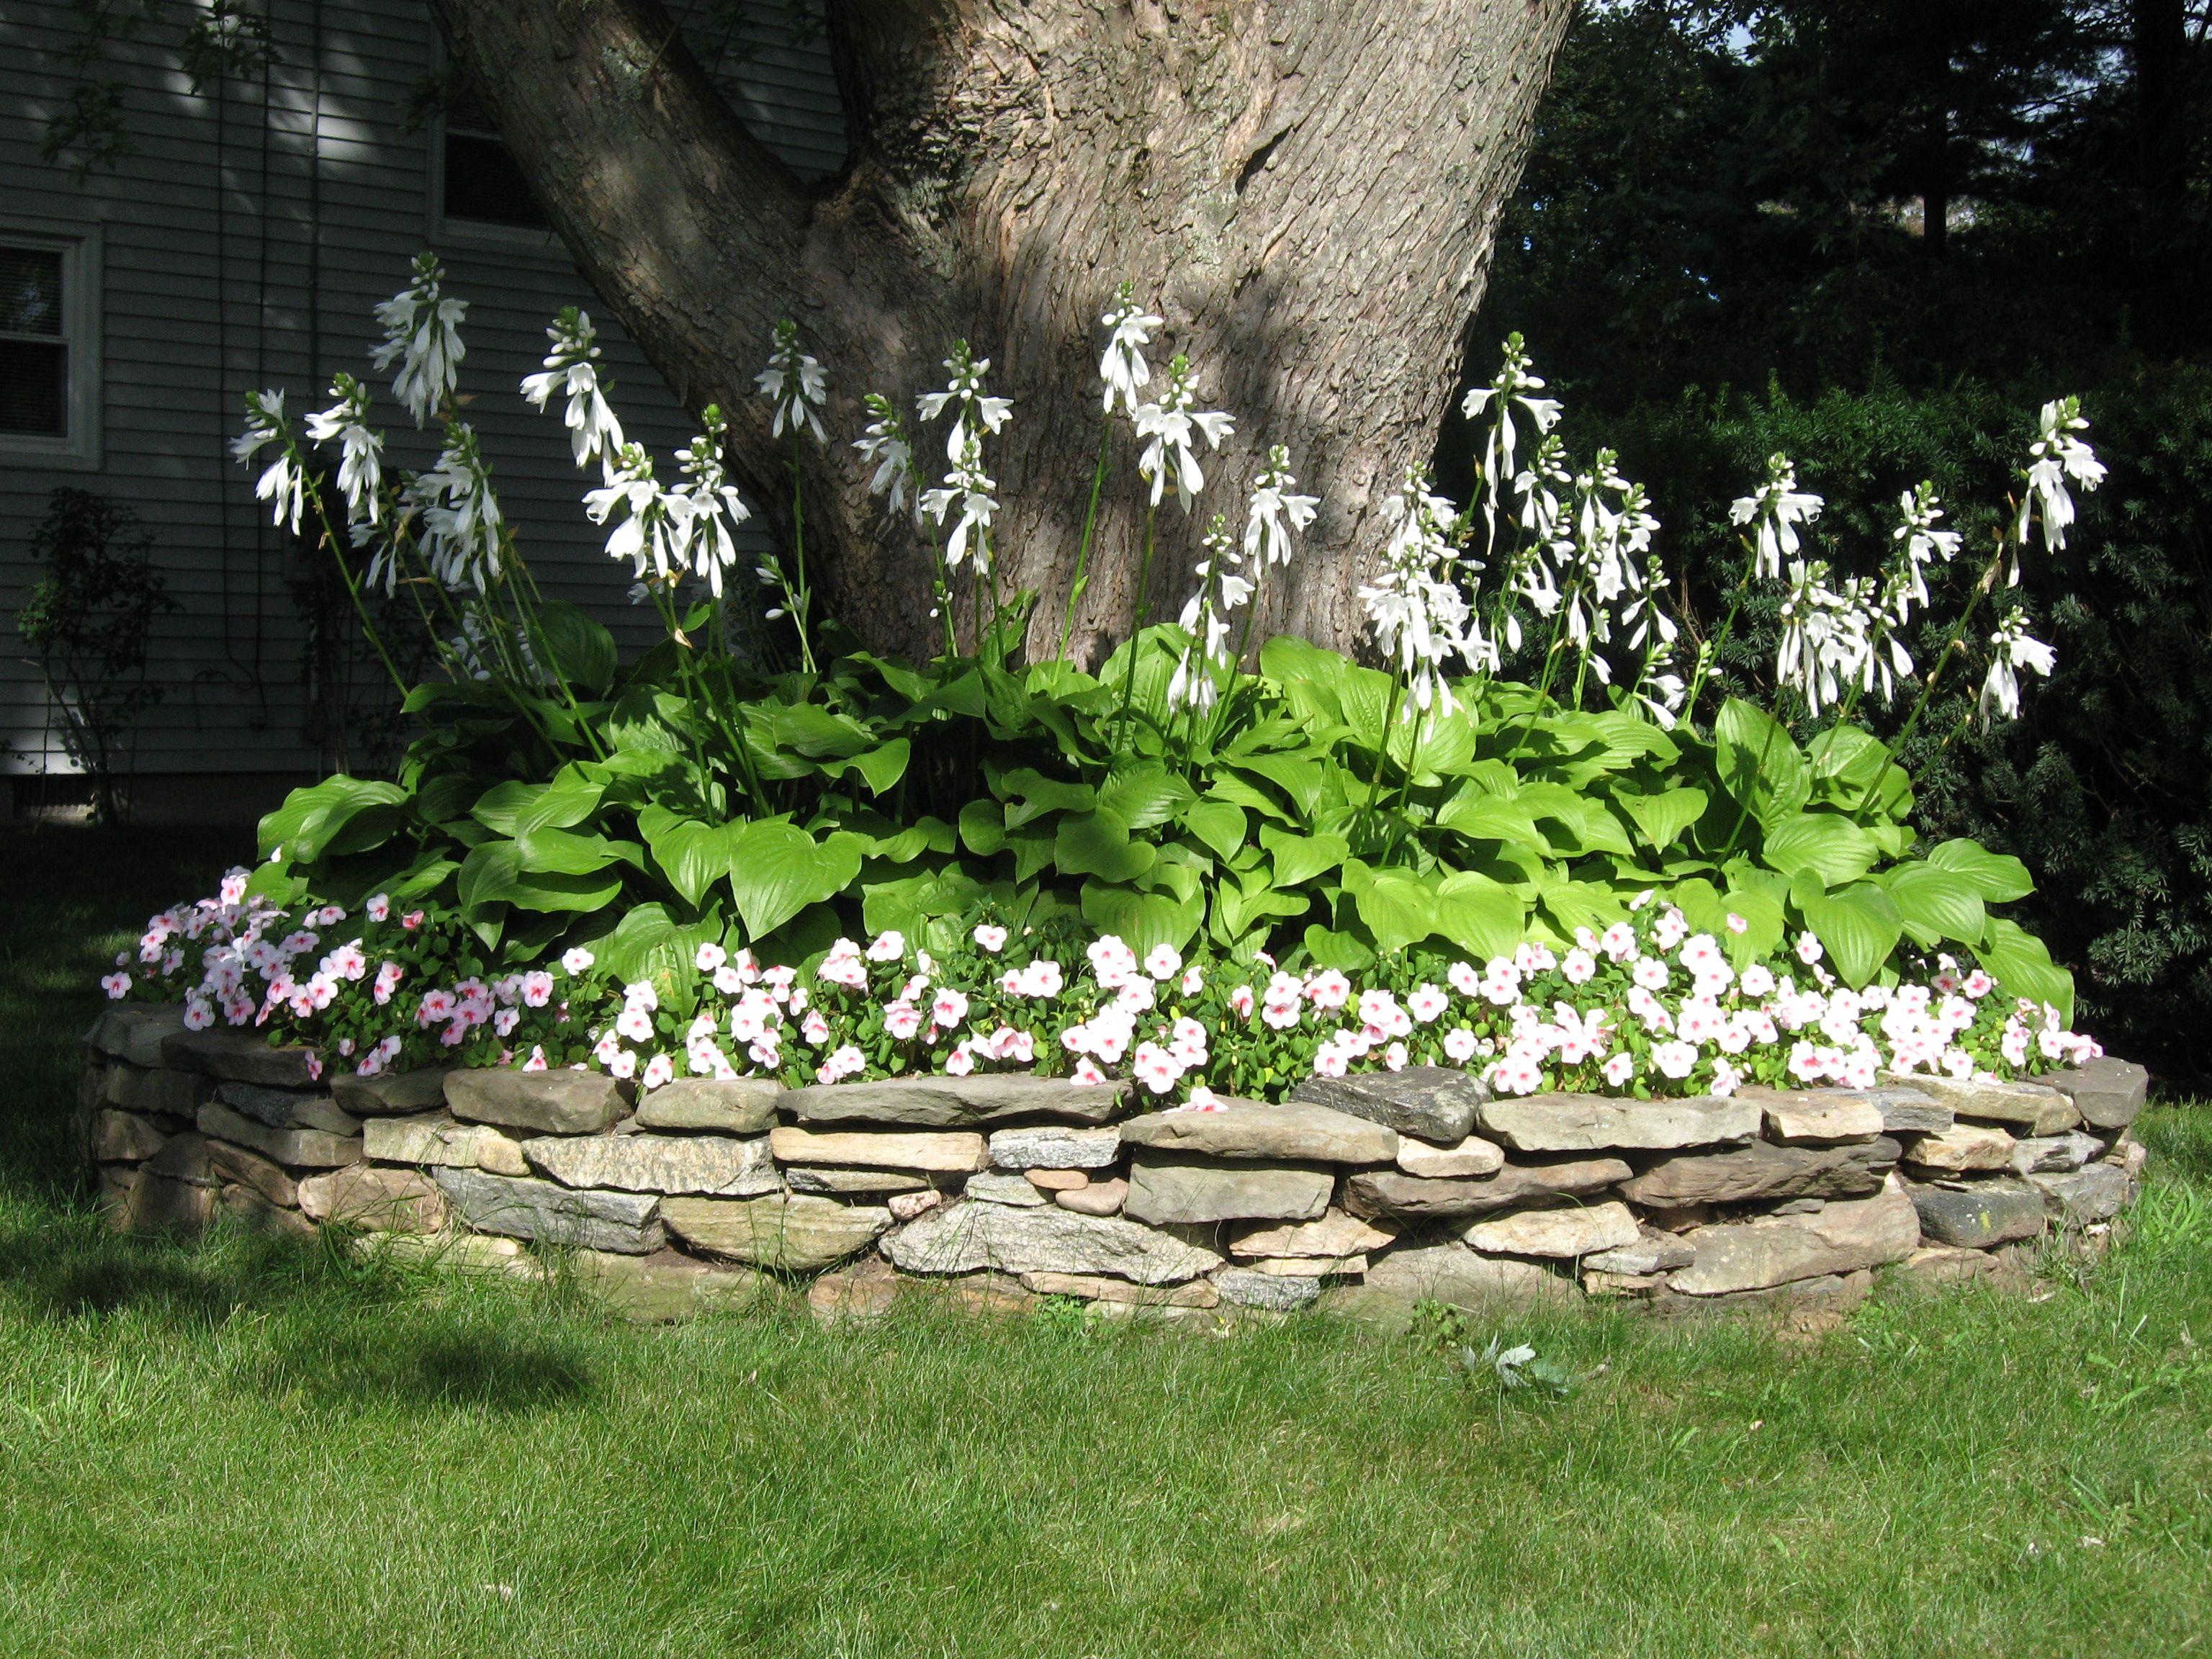 Garden ideas Hosata and Impatiens Great combo